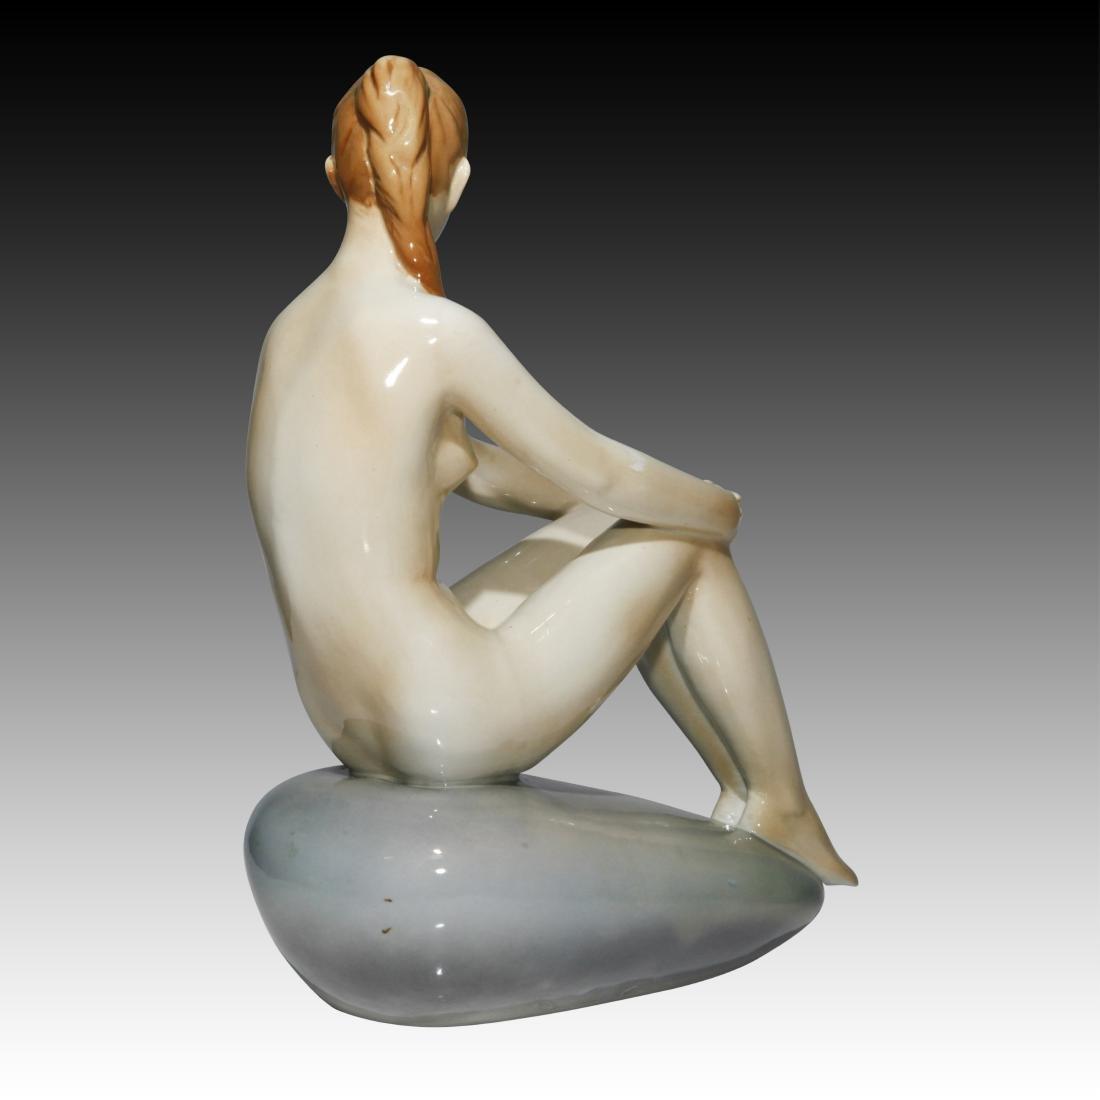 Zsolnan Nude Female on a Rock 4027 - 2